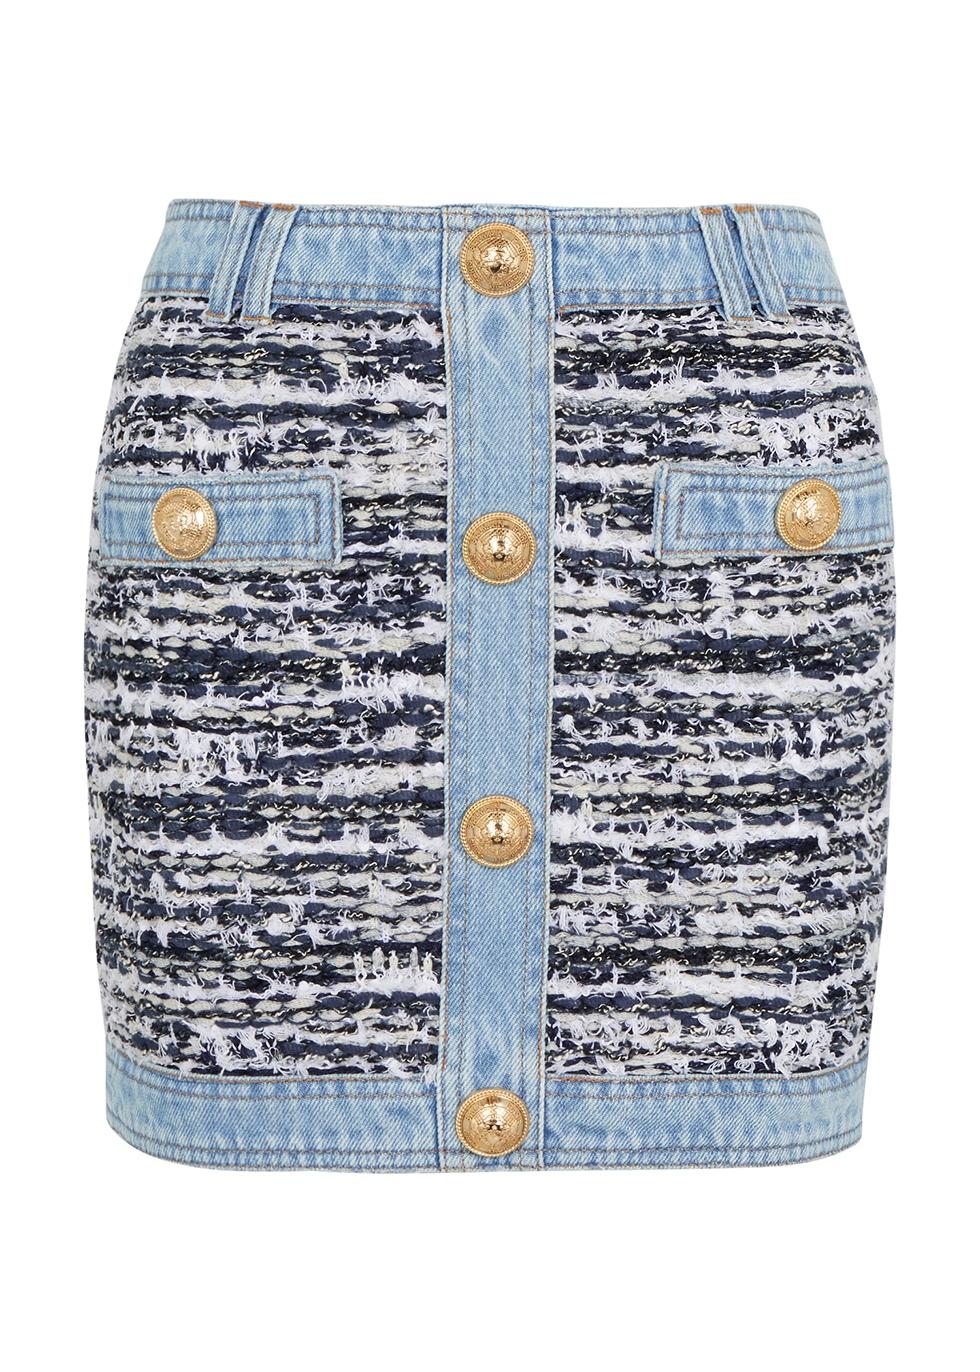 Panelled denim and bouclé tweed mini skirt